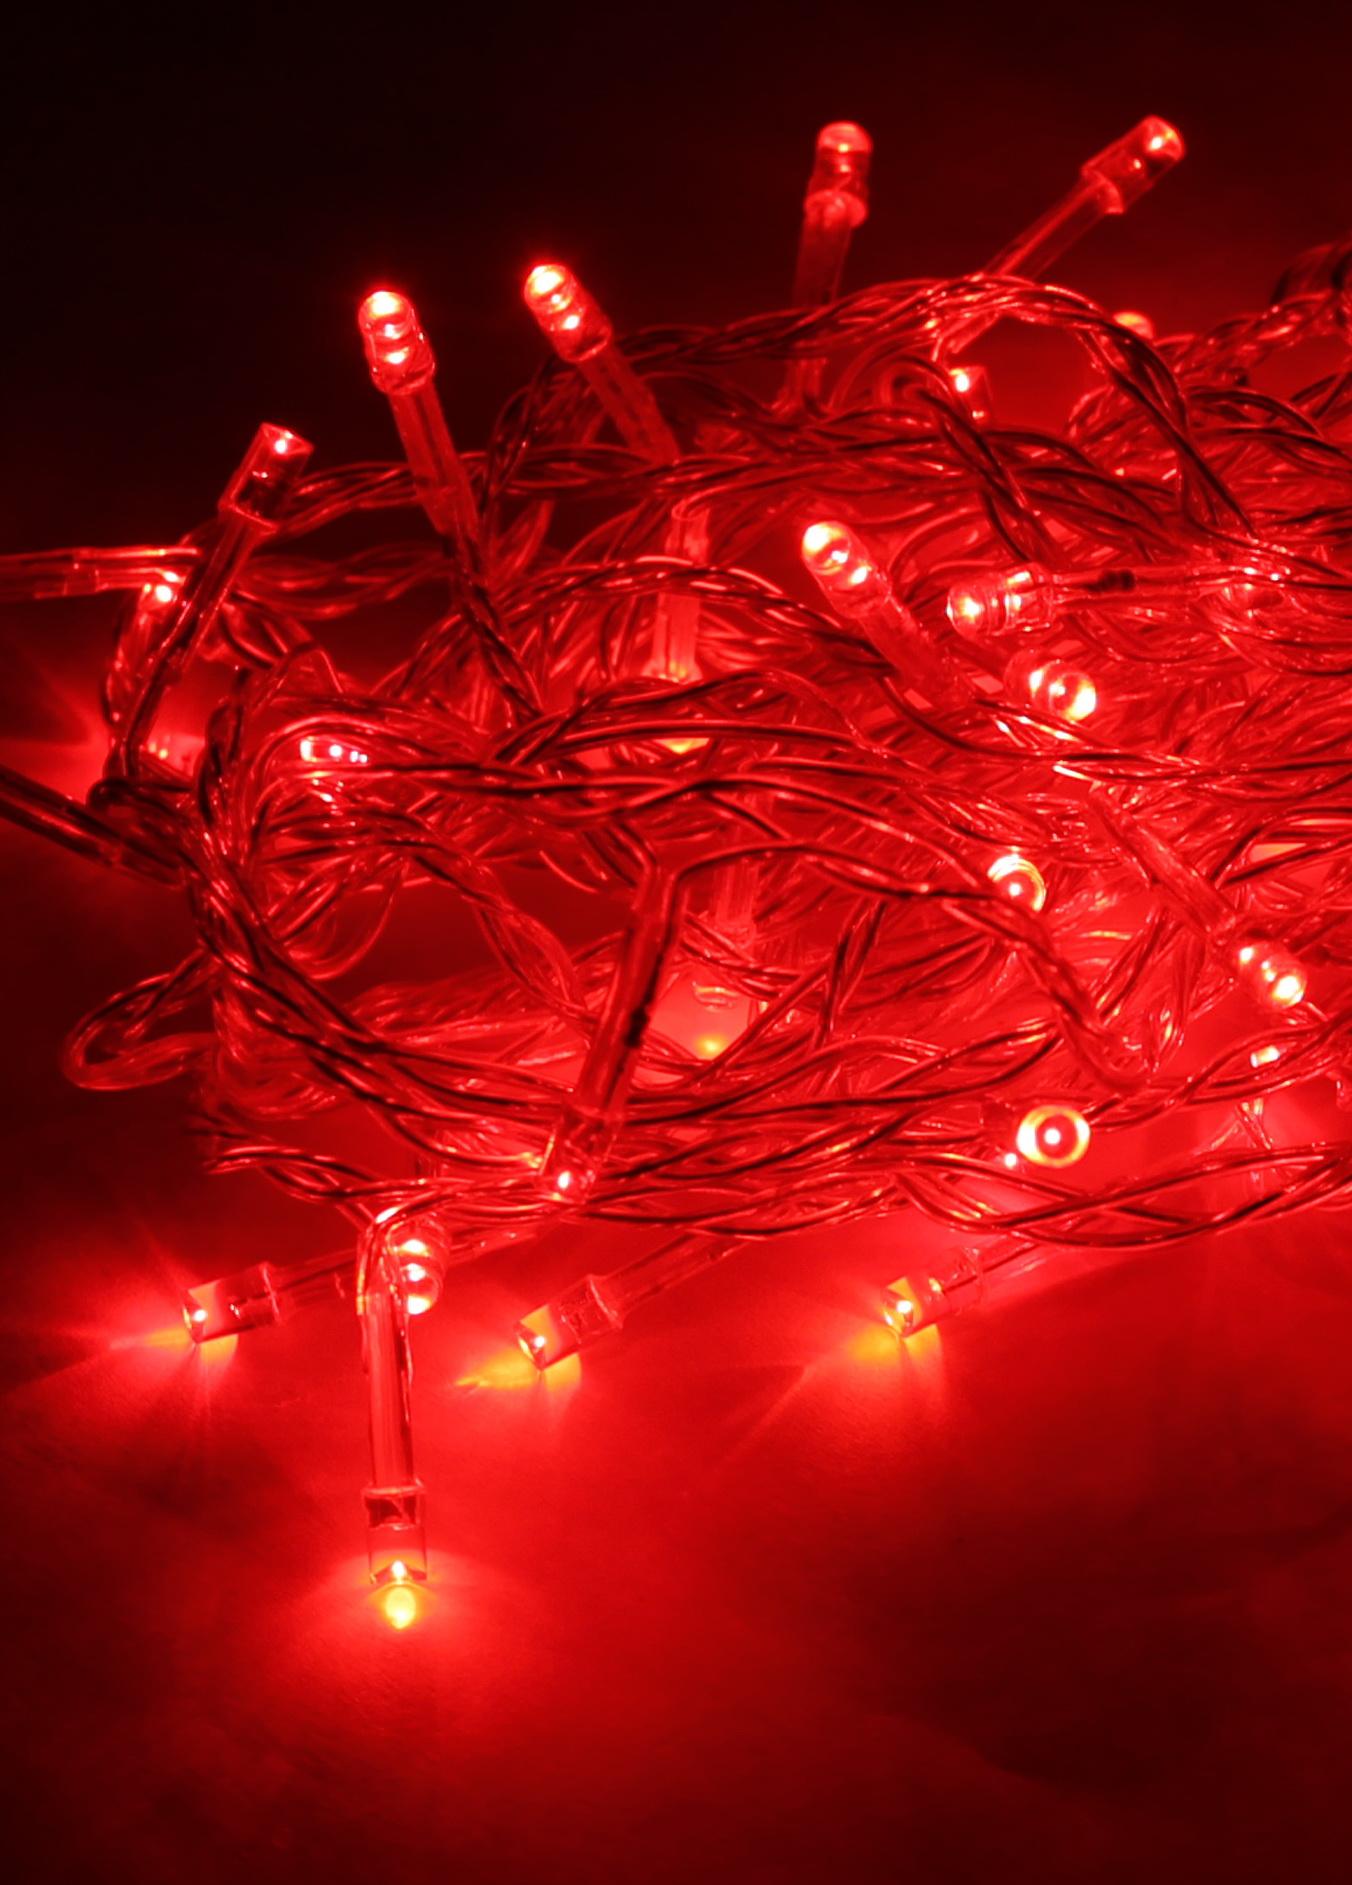 Электрогирлянда КОСМОС Koc gir80led r электрогирлянда космос koc net240led b сеть 1 8мх1 7м 240led с контроллером шнур3м ip20